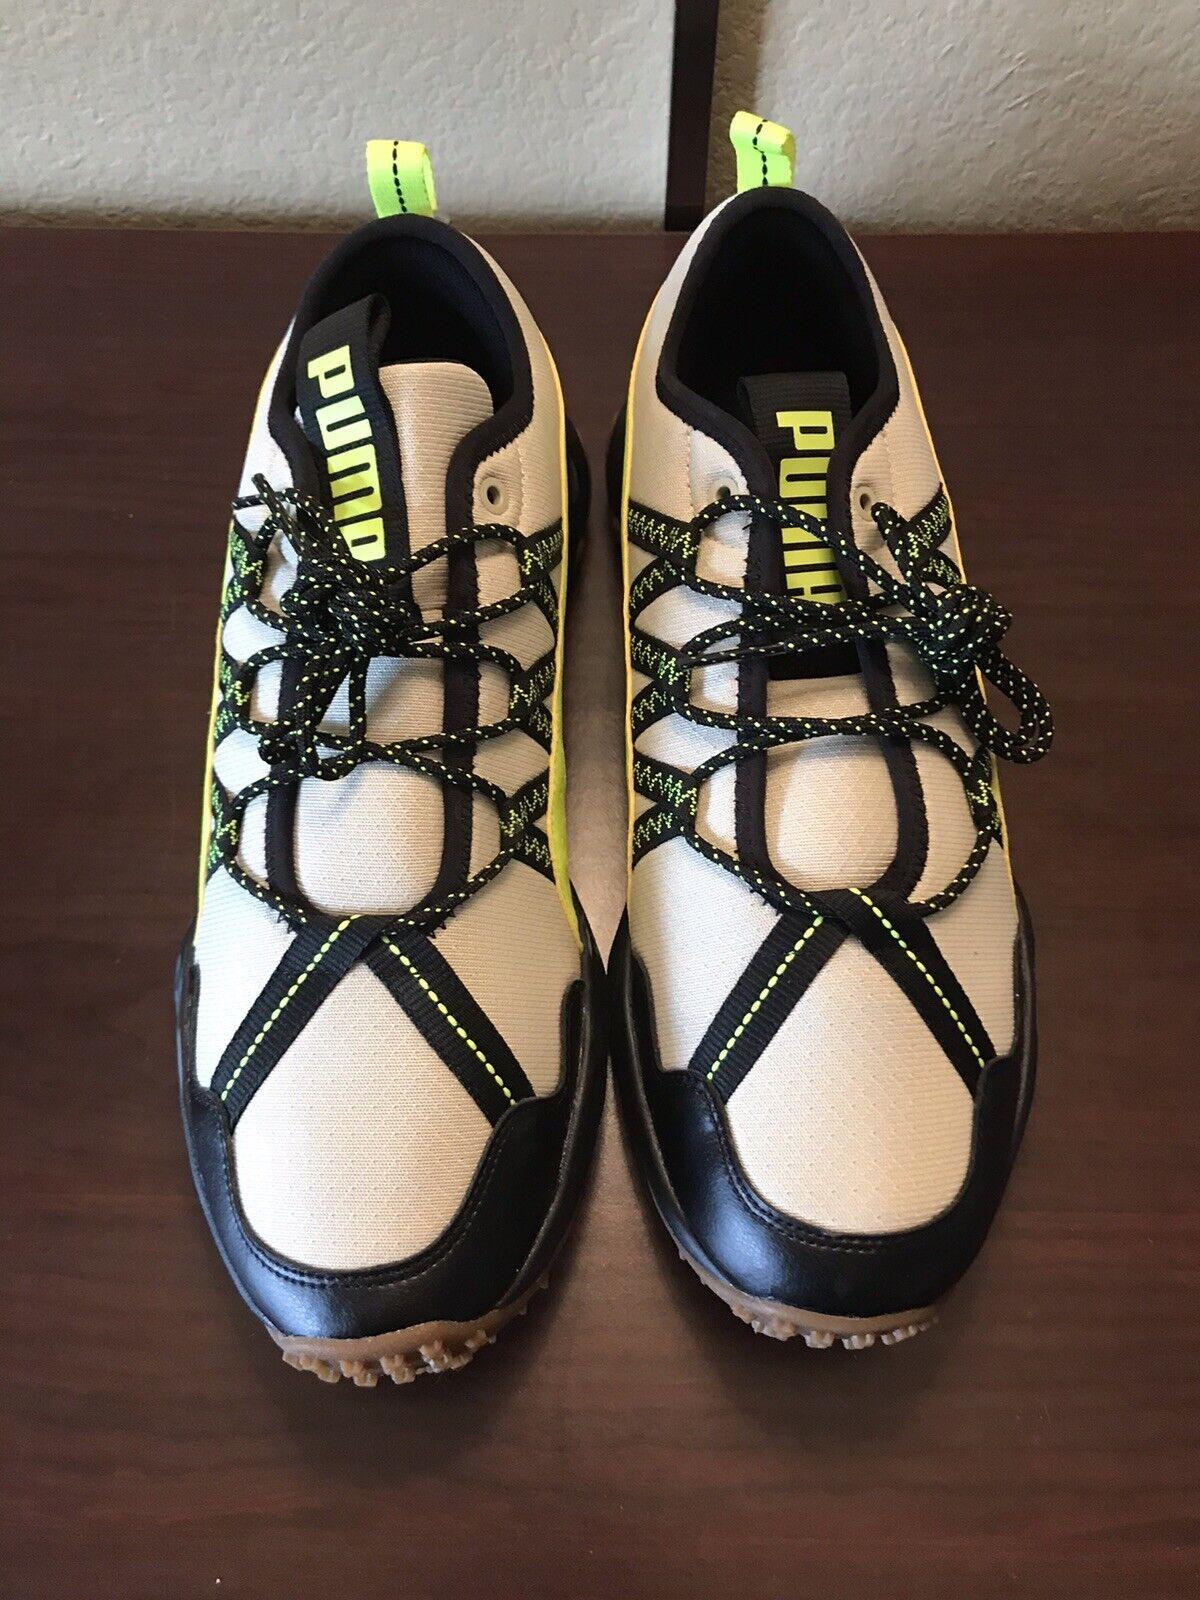 PUMA Ember Trail Running Men's Shoes Hiking Outdoors Beige B